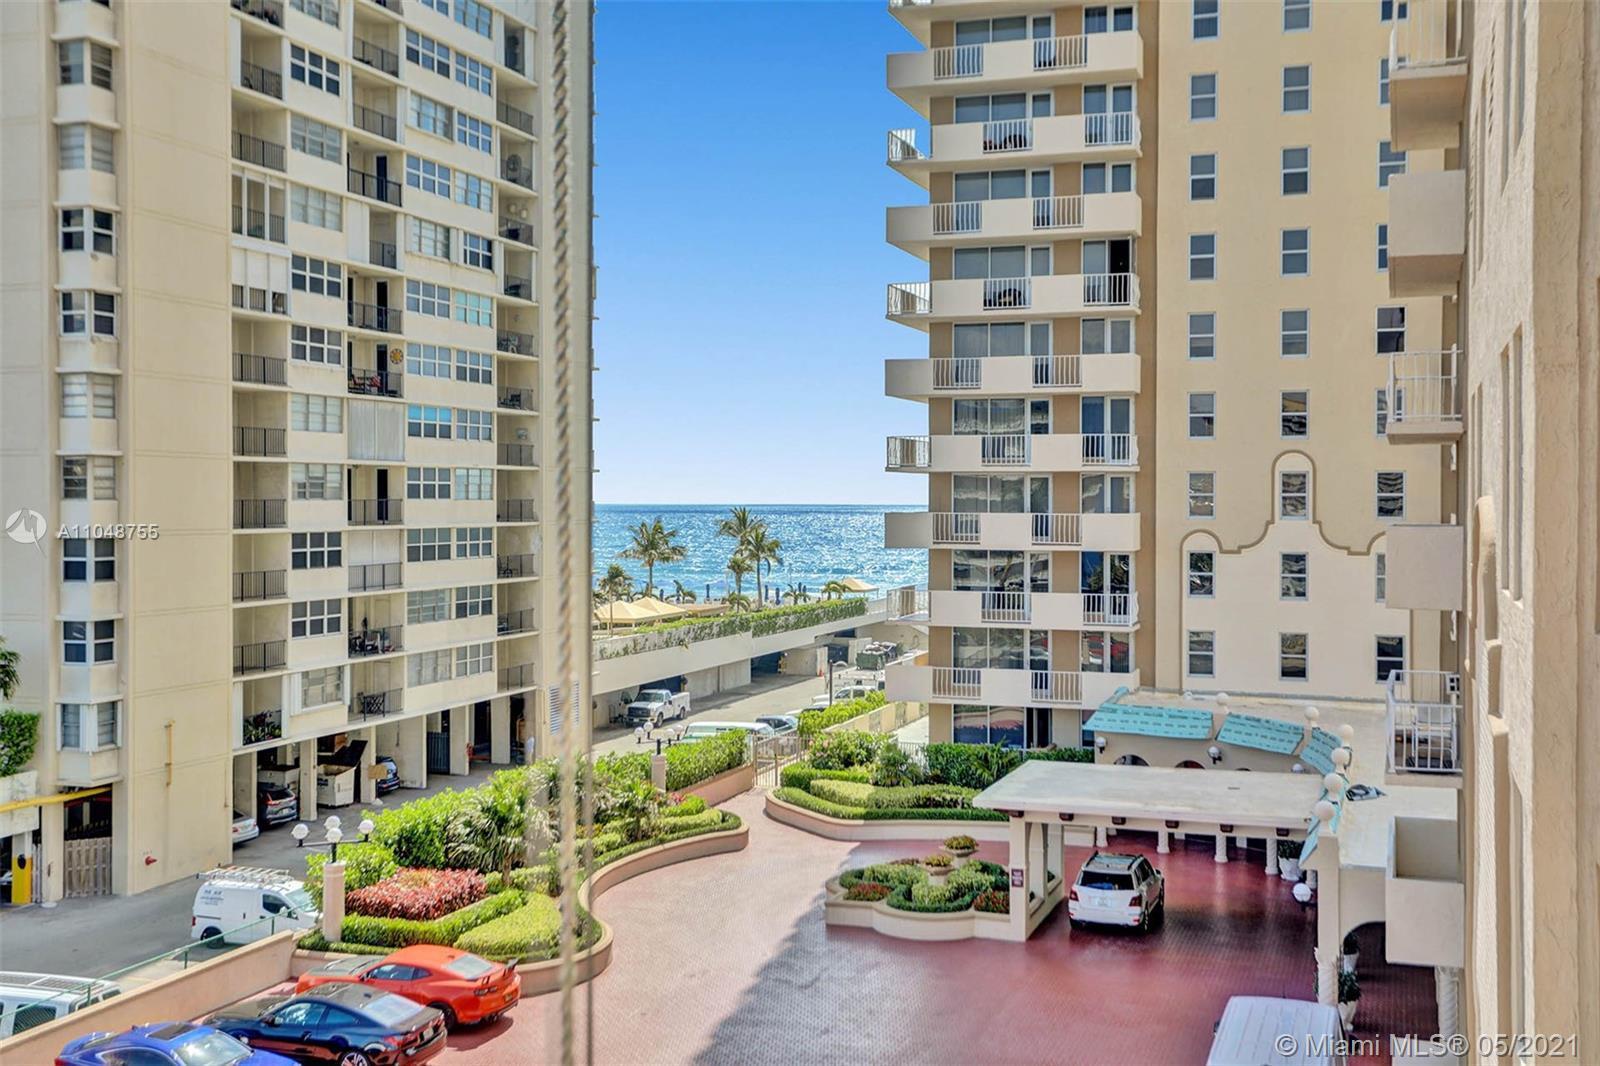 Malaga Towers - condos for sale in Hallandale Beach